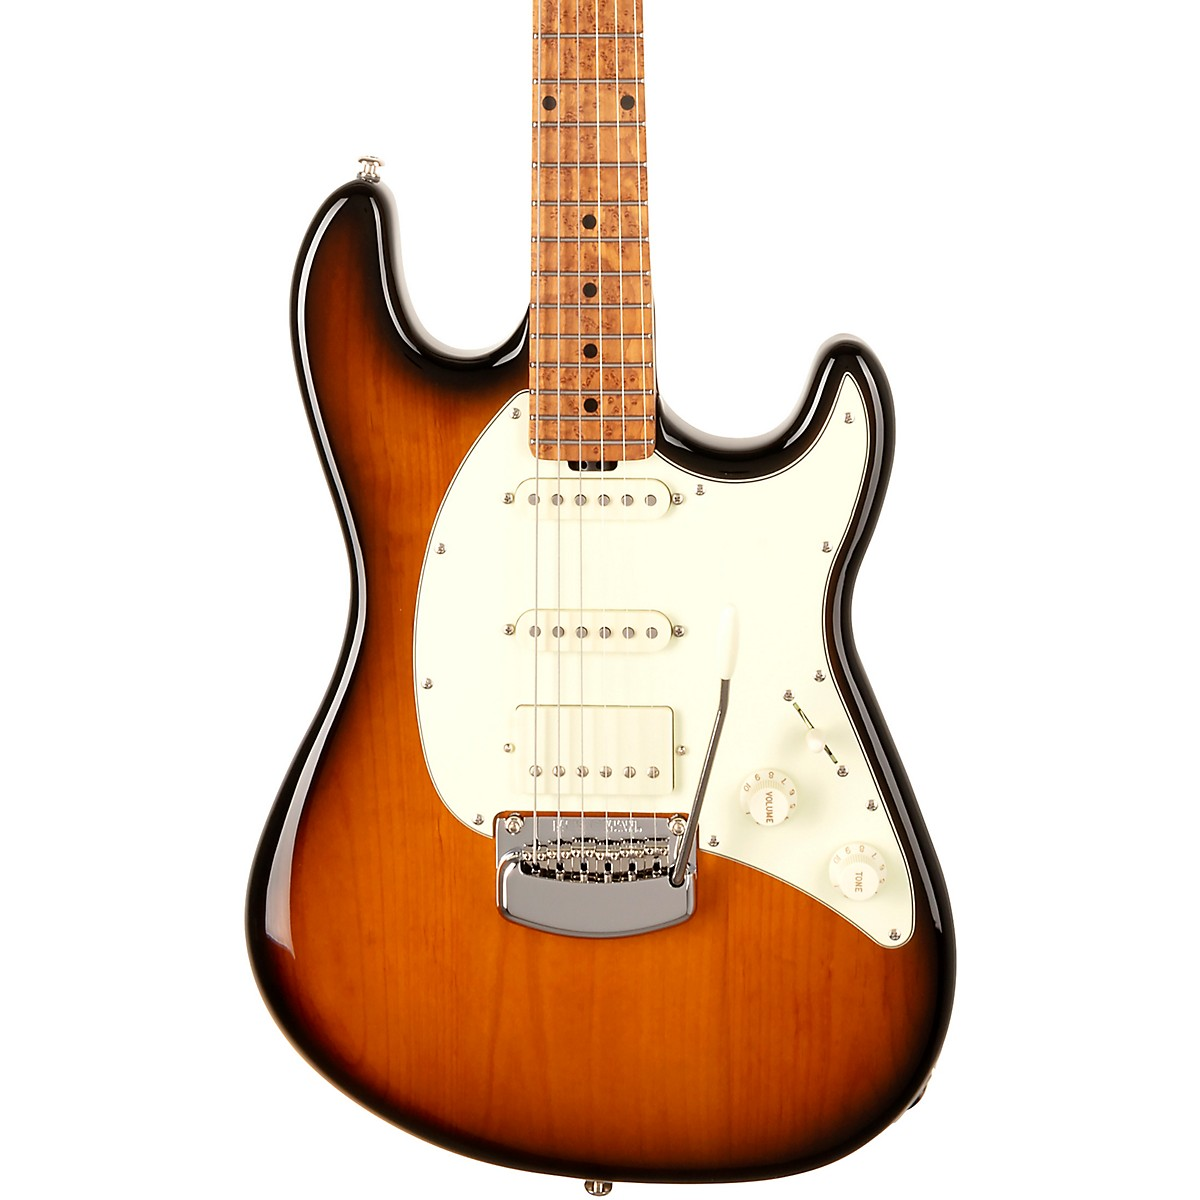 Ernie Ball Music Man Cutlass HSS Trem Electric Guitar